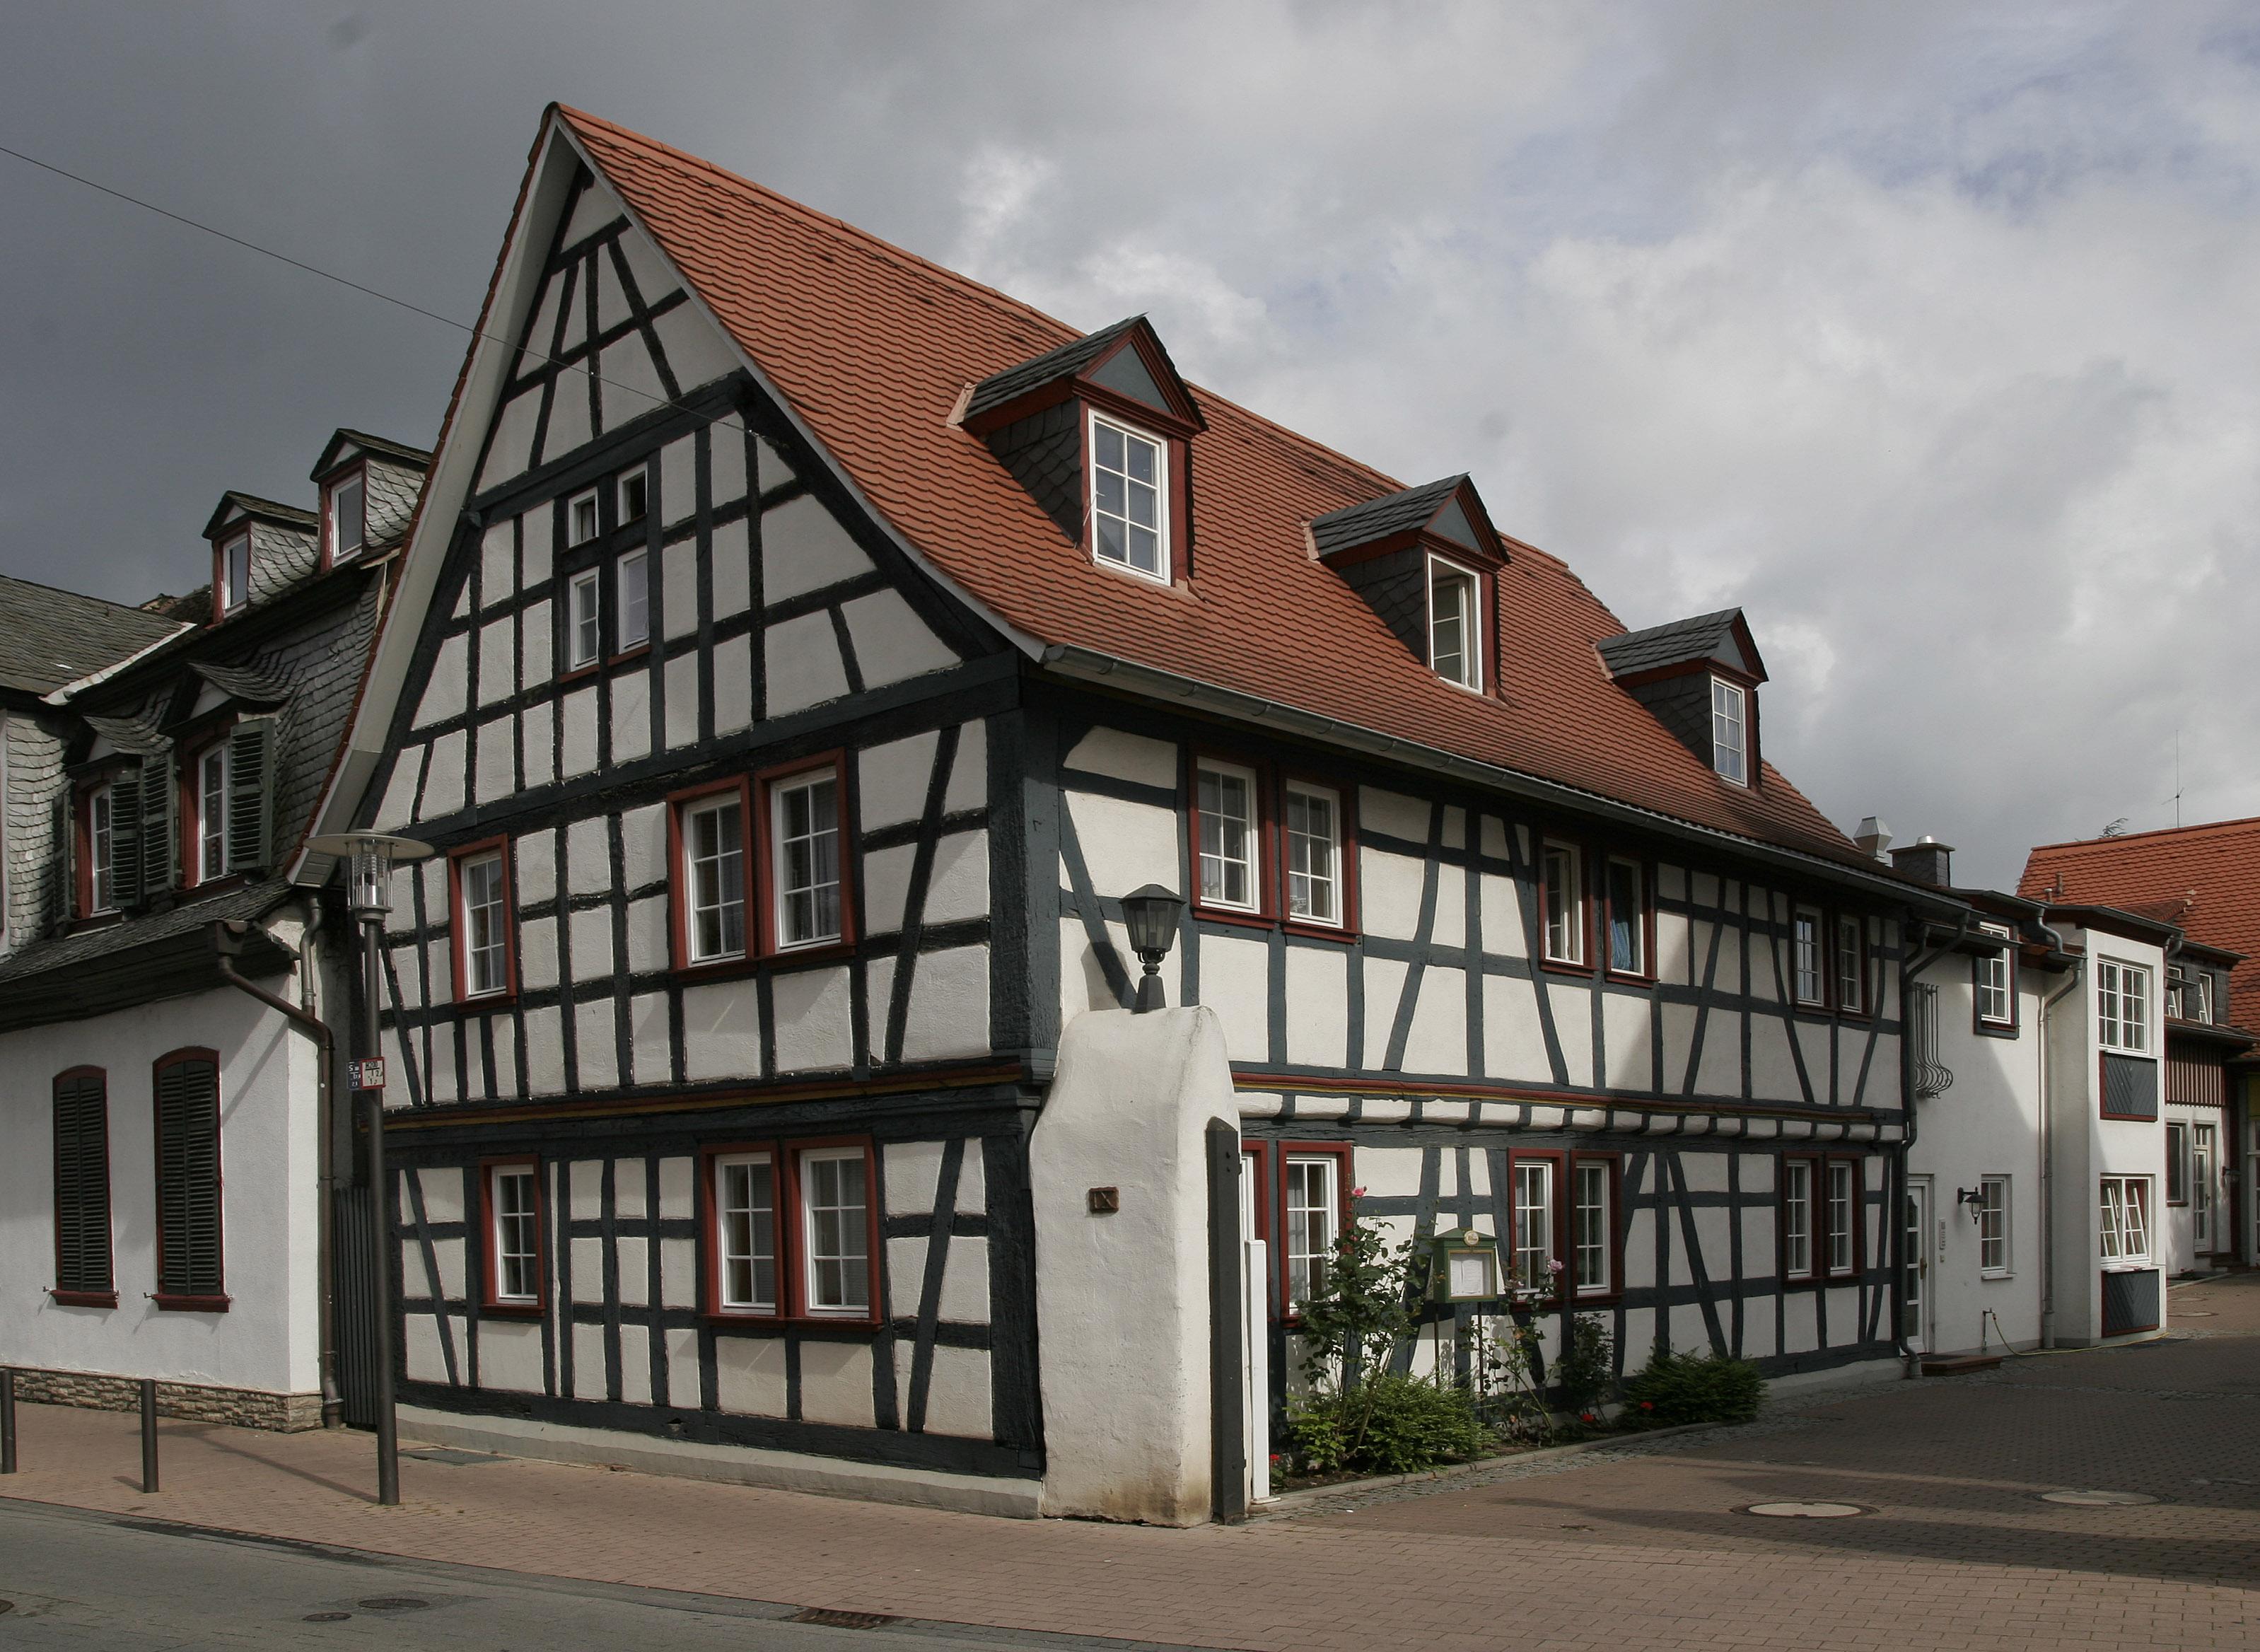 Gross-Gerau Germany  City pictures : Gross Gerau Fachwerk 06 Wikimedia Commons